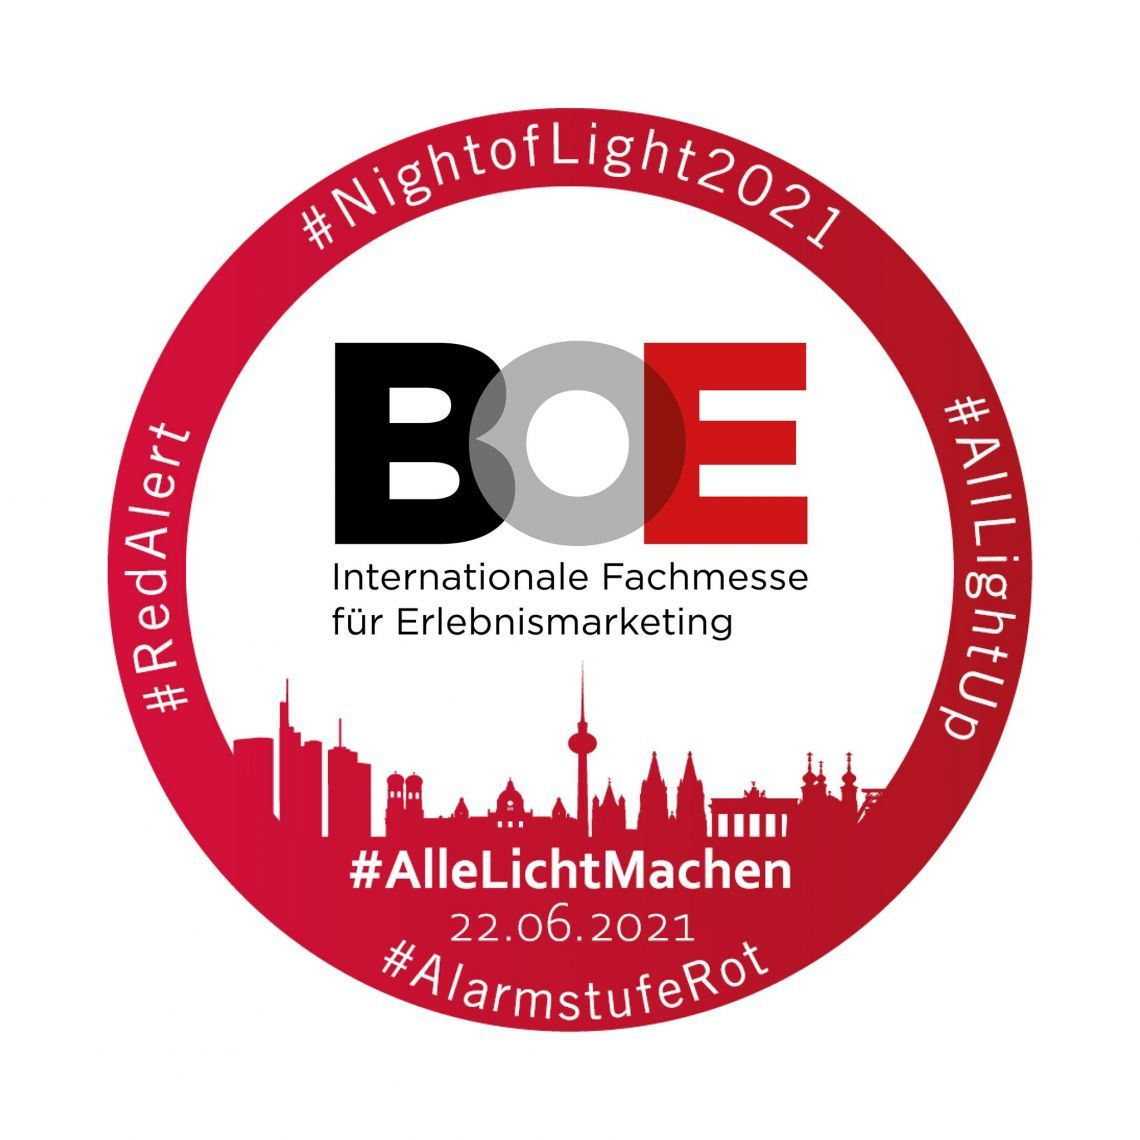 Night of Light 2021: Messe Dortmund leuchtet rot